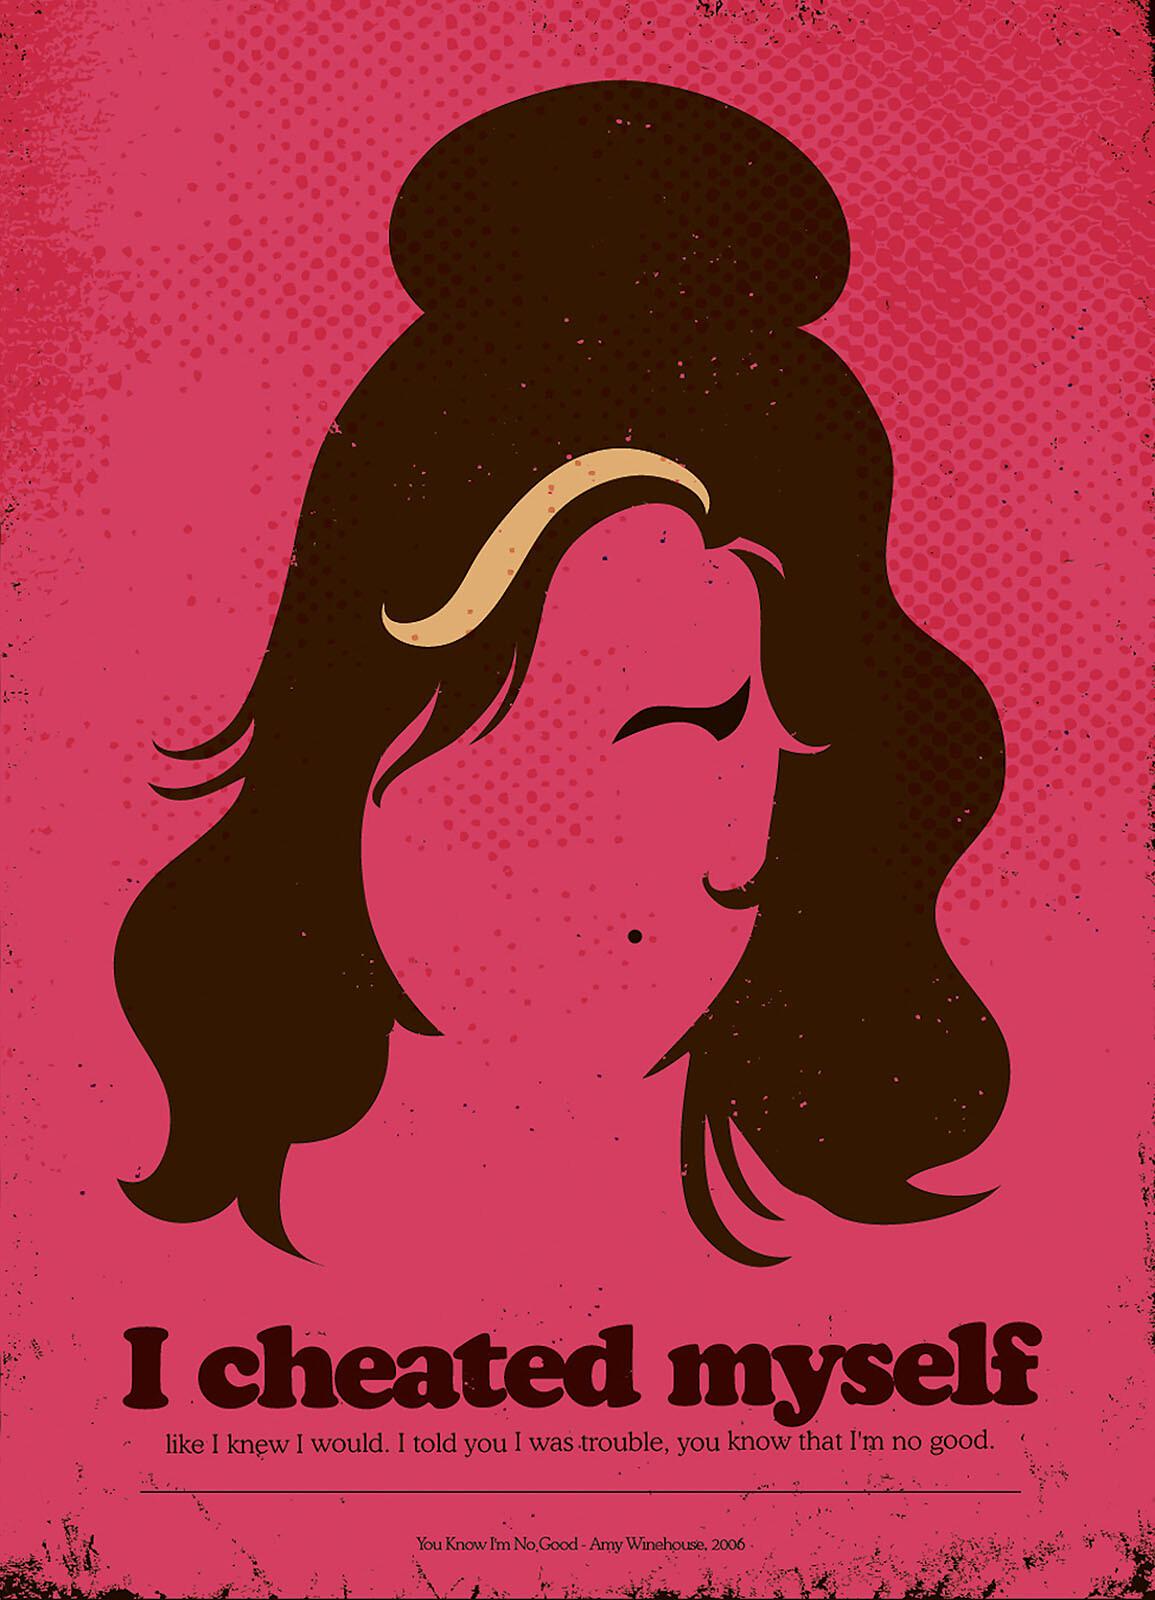 I cheated myself - Rafael Barletta